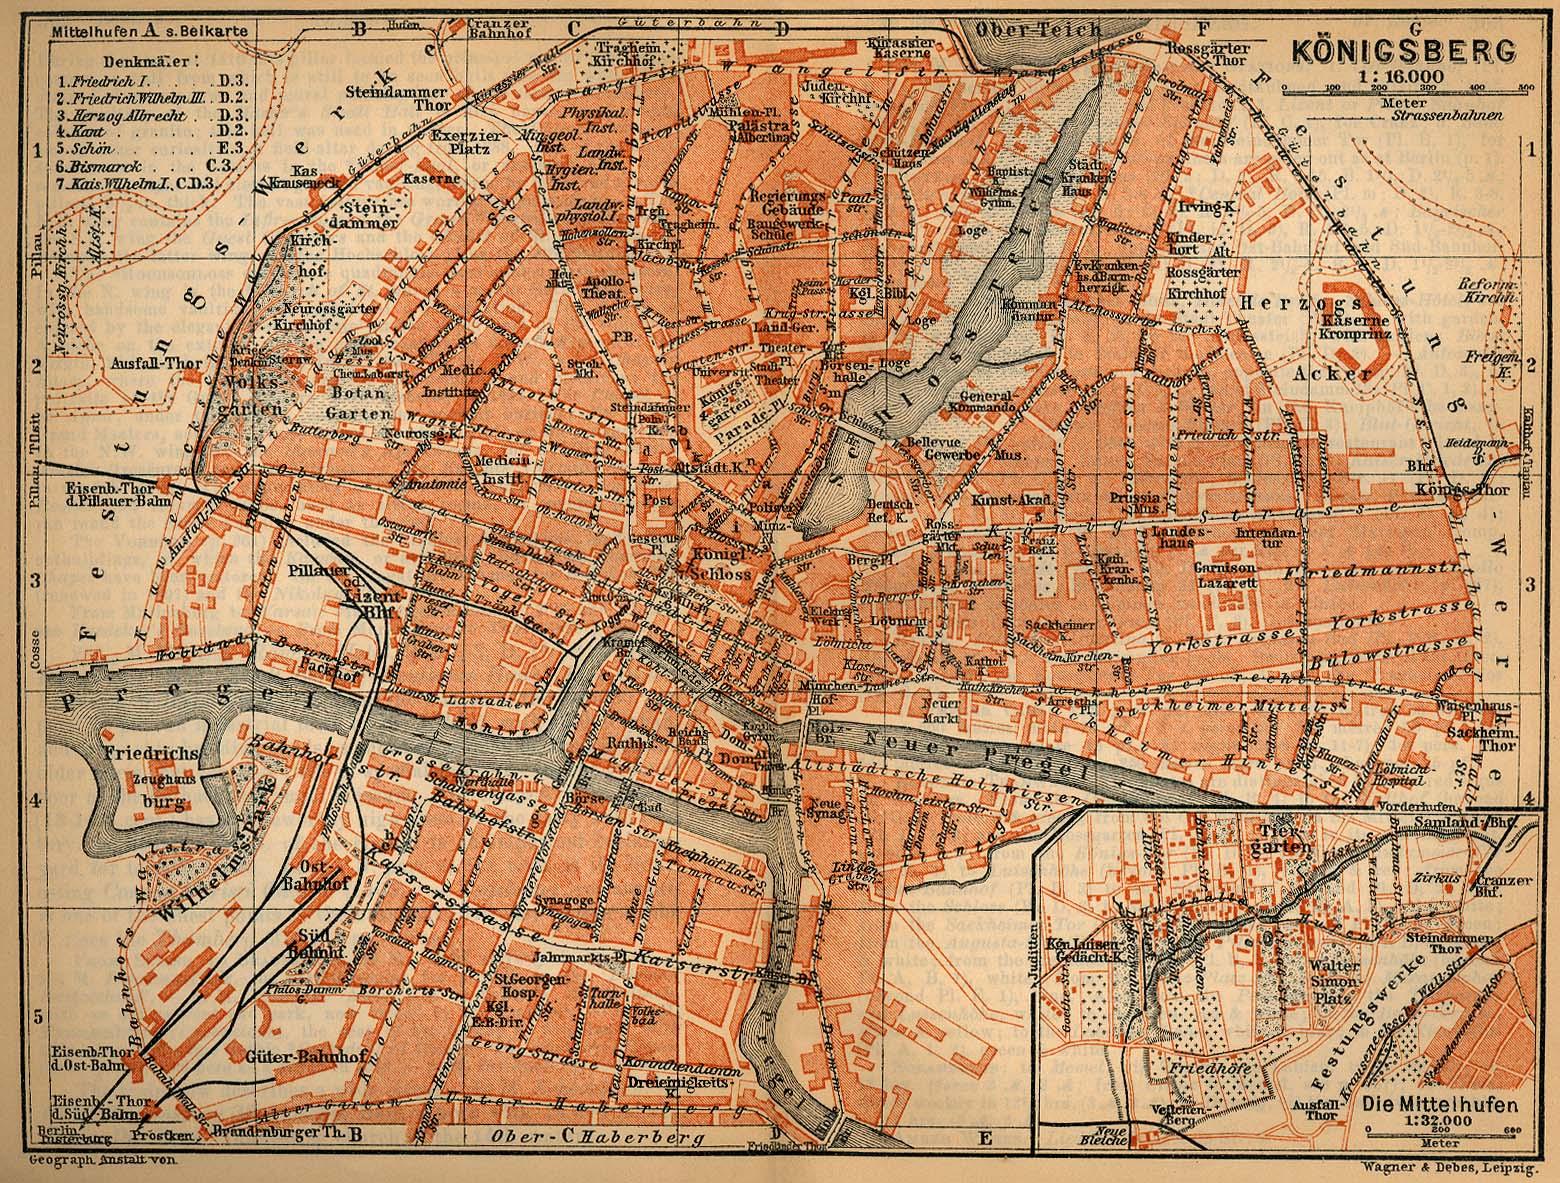 Mapa de Kaliningrado (Königsberg), Rusia 1910